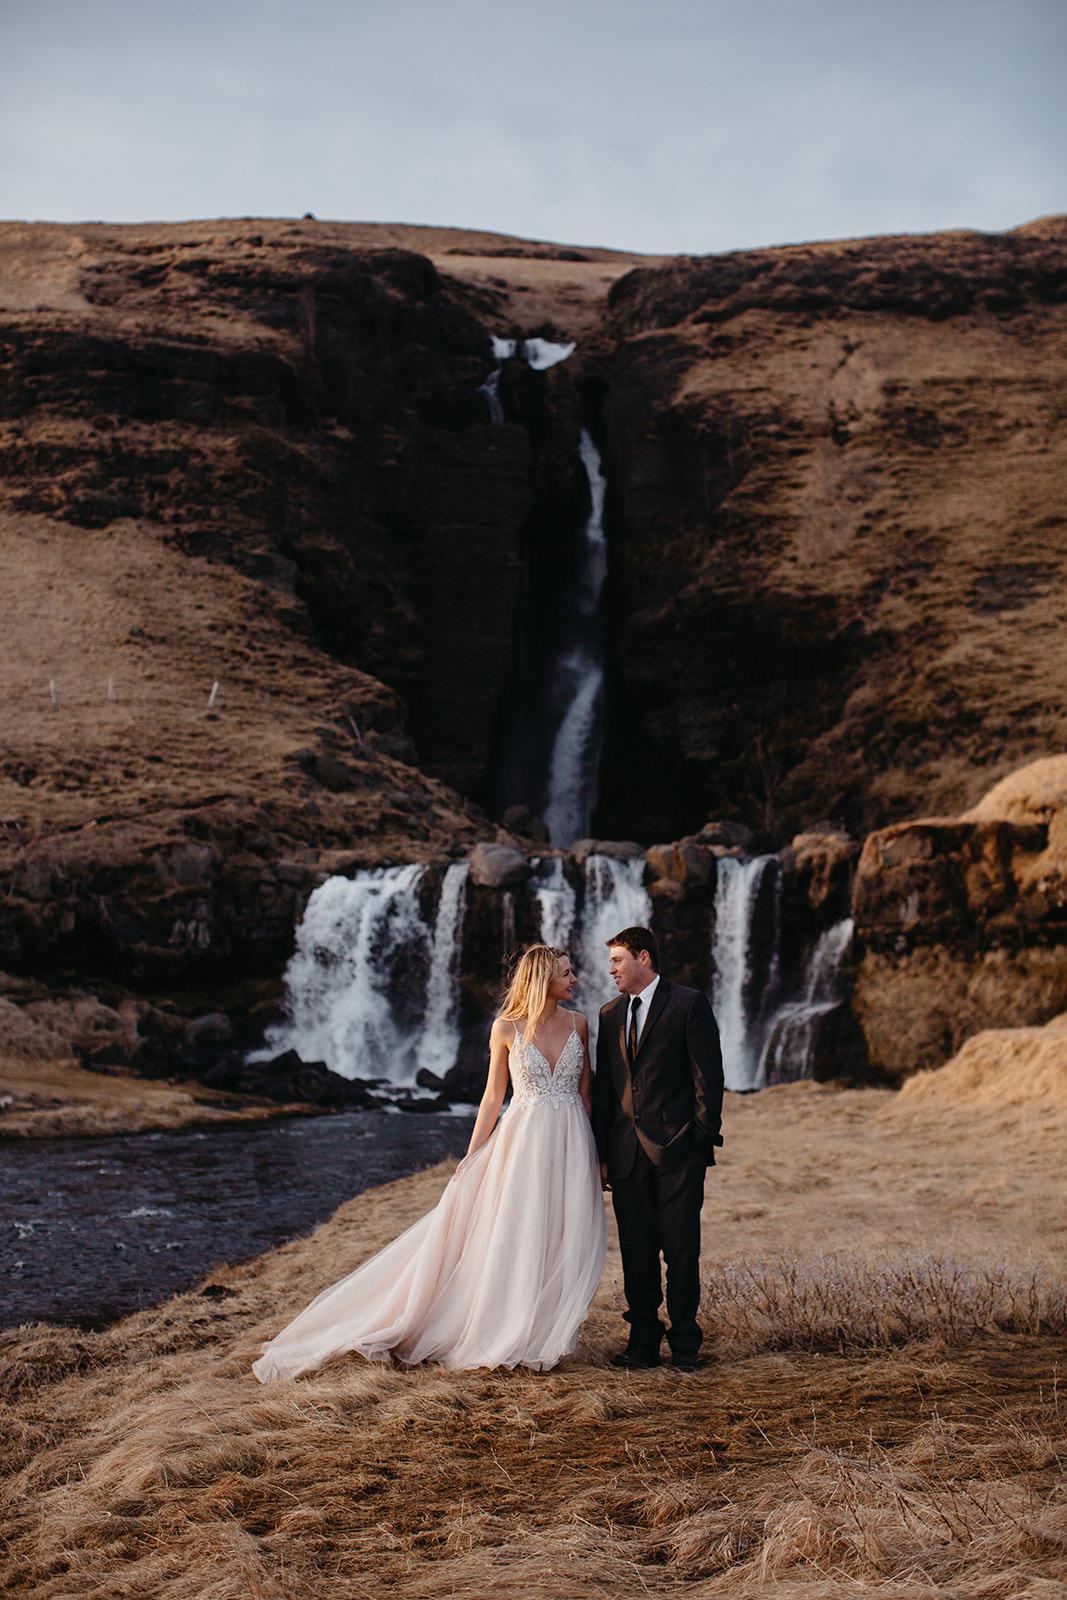 Icelandic Iceland Elopement Wedding Elope Photographer Eloping Reykjavík Vik Black Sand Beach Jökulsárlón Skogafoss Waterfall Vestrahorn Mountain Liz Osban Photography Destination 114.jpg